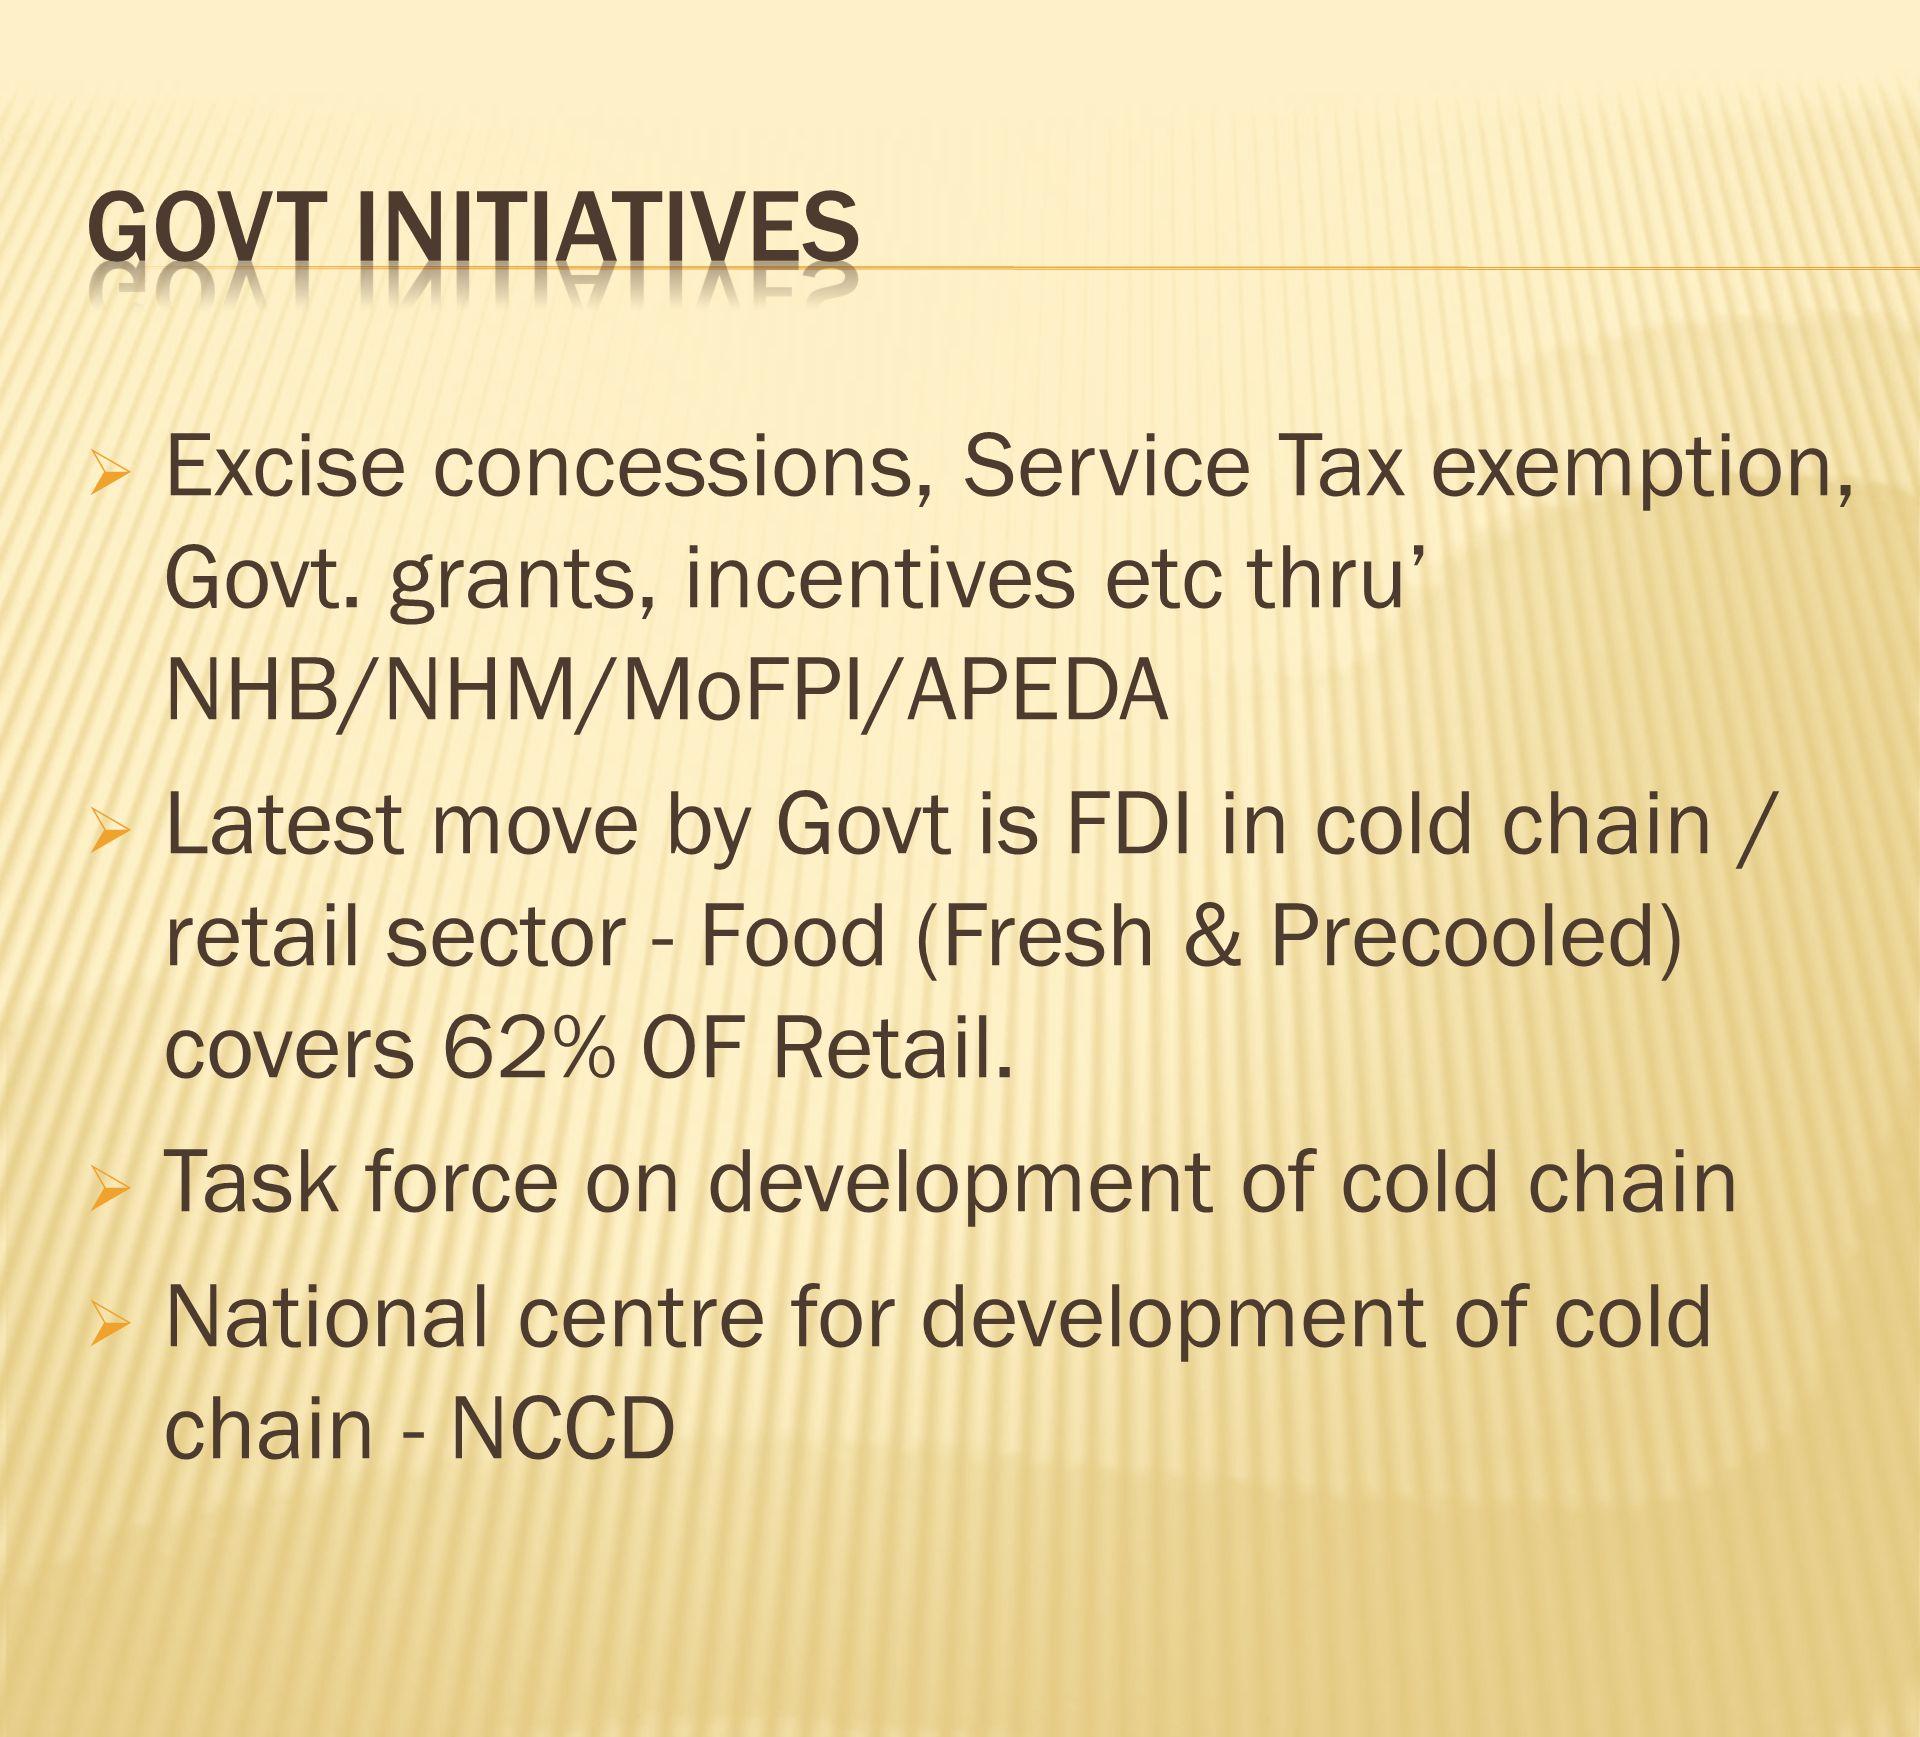 Govt initiatives Excise concessions, Service Tax exemption, Govt. grants, incentives etc thru' NHB/NHM/MoFPI/APEDA.